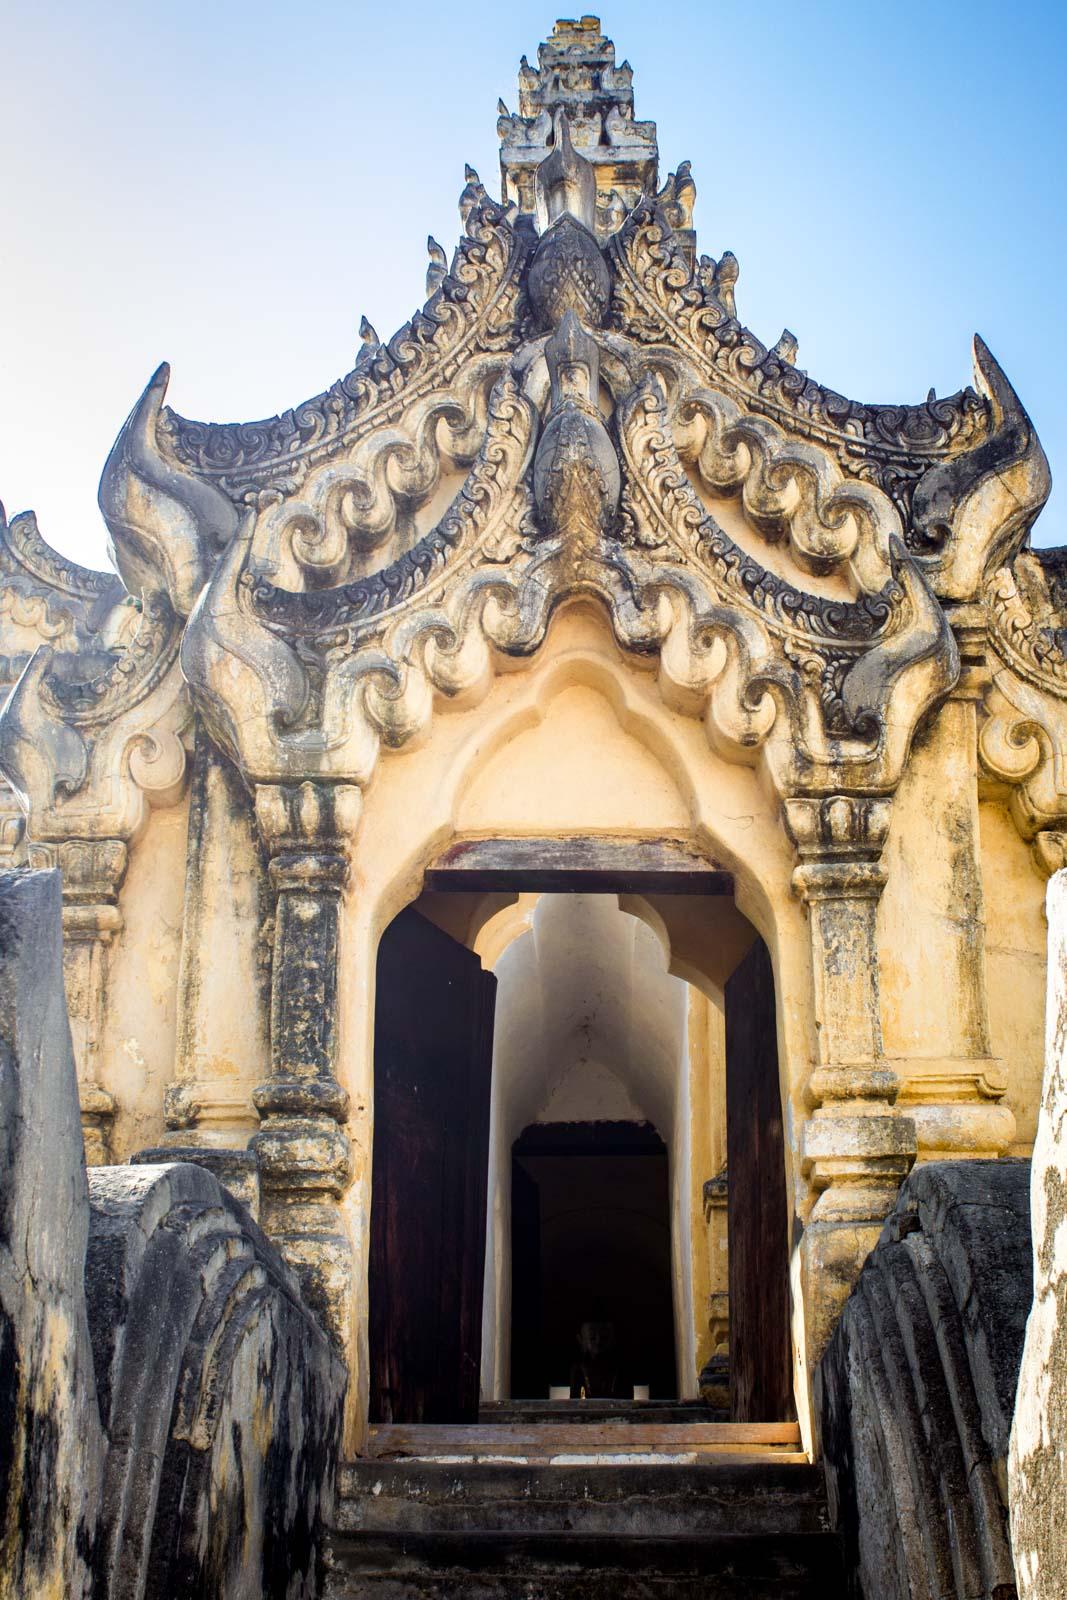 Inwa near Mandalay, Myanmar